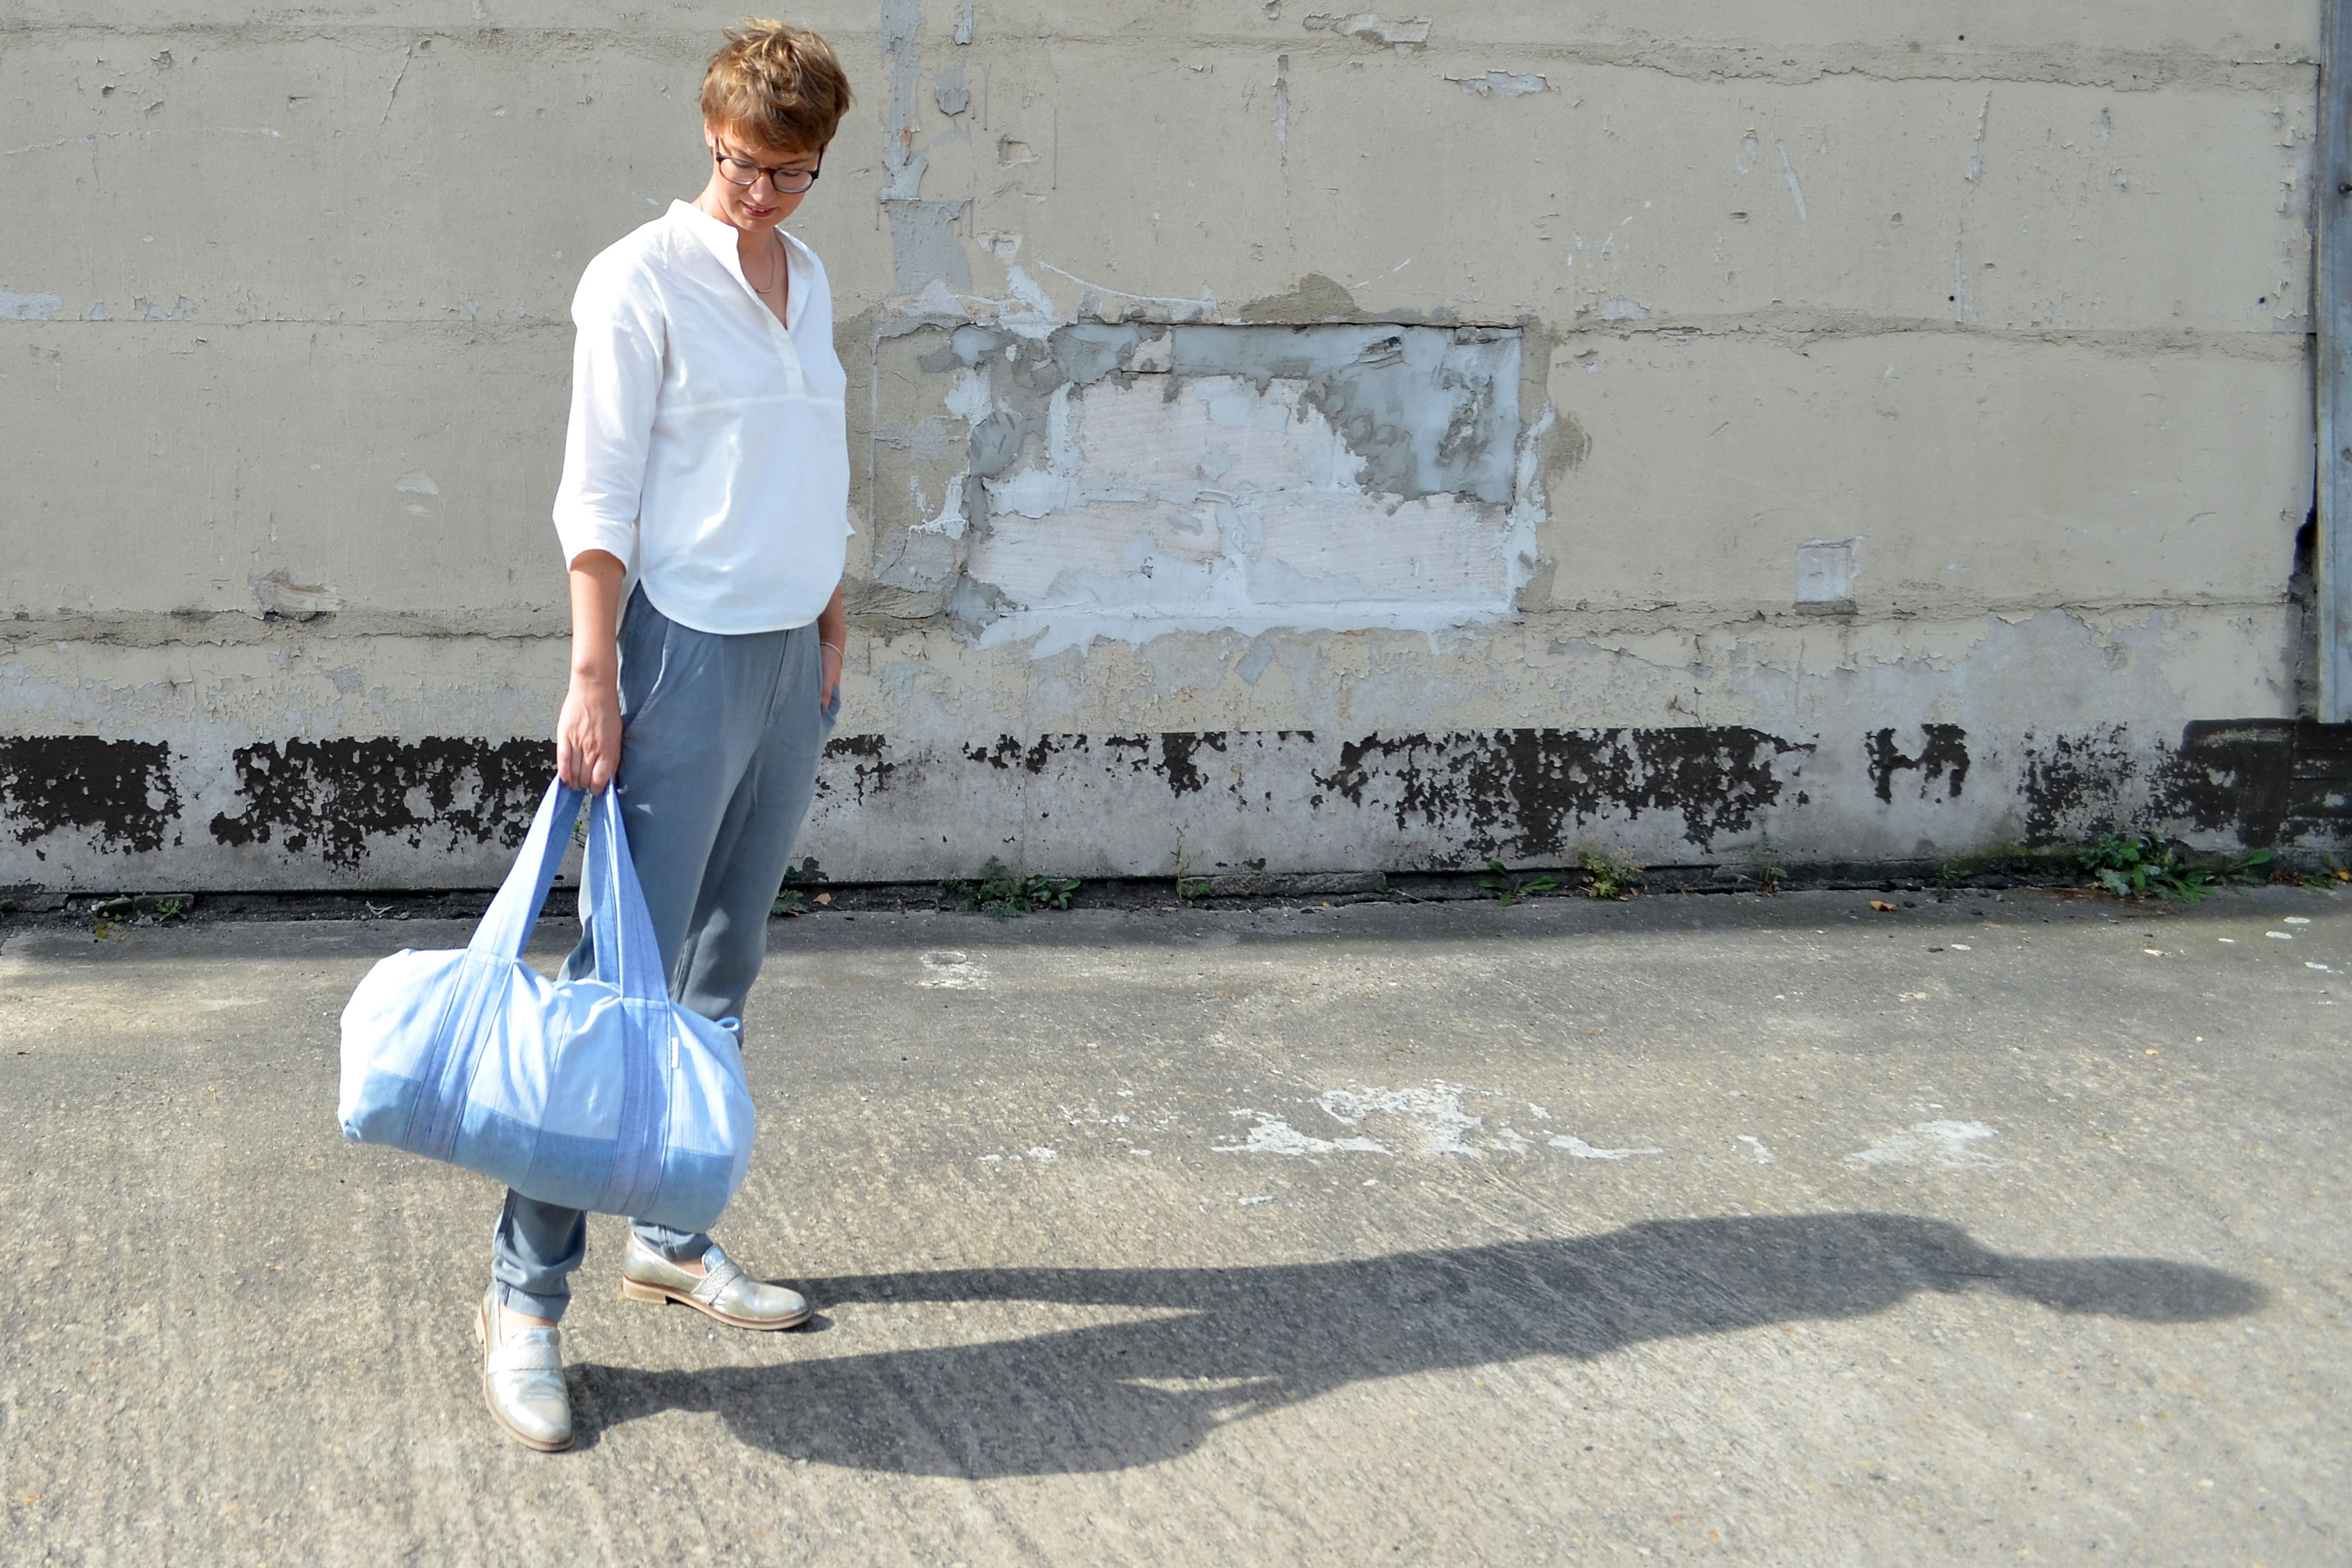 Upcycling Berlin dzaino-upcycling-berlin - conscious lifestyle of mine